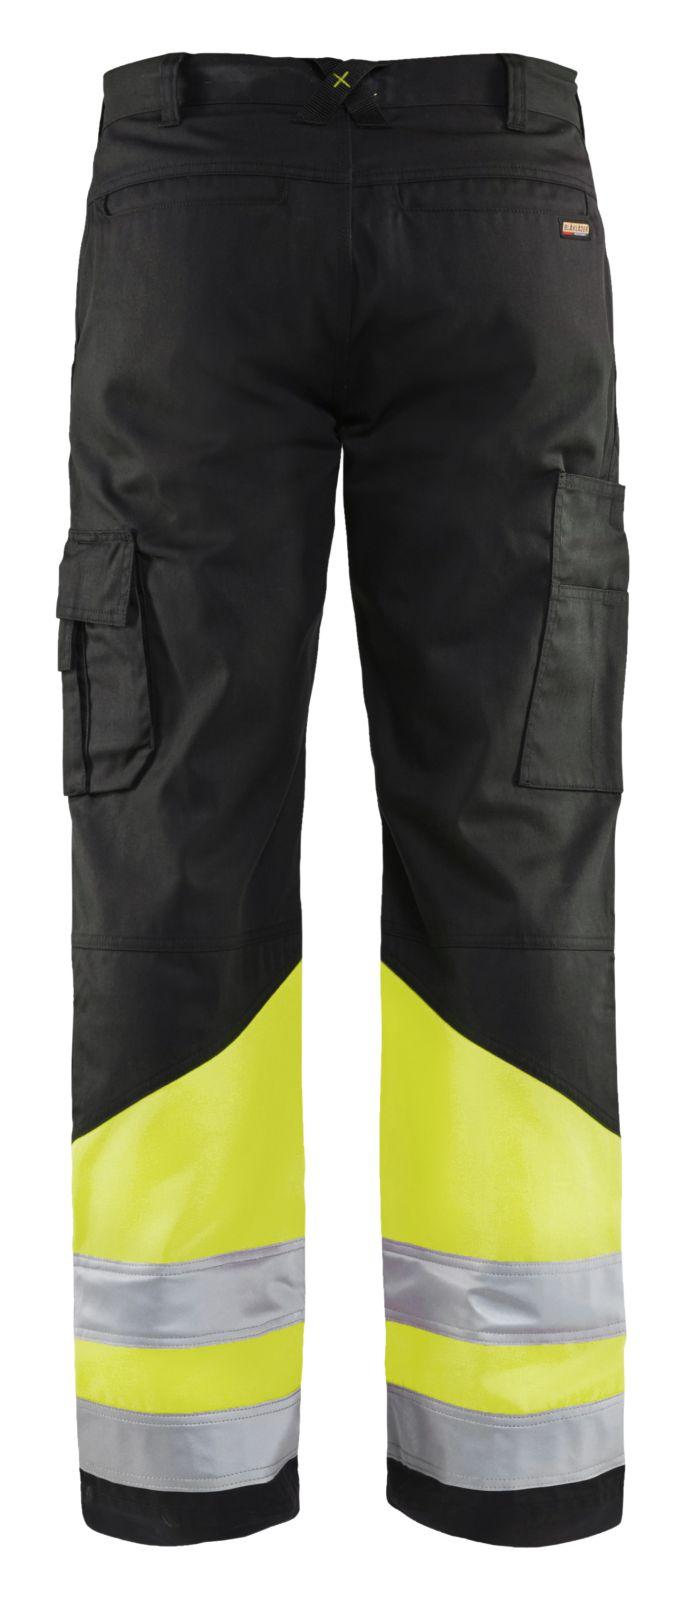 Blaklader Werkbroeken 15641811 High Vis zwart-geel(9933)